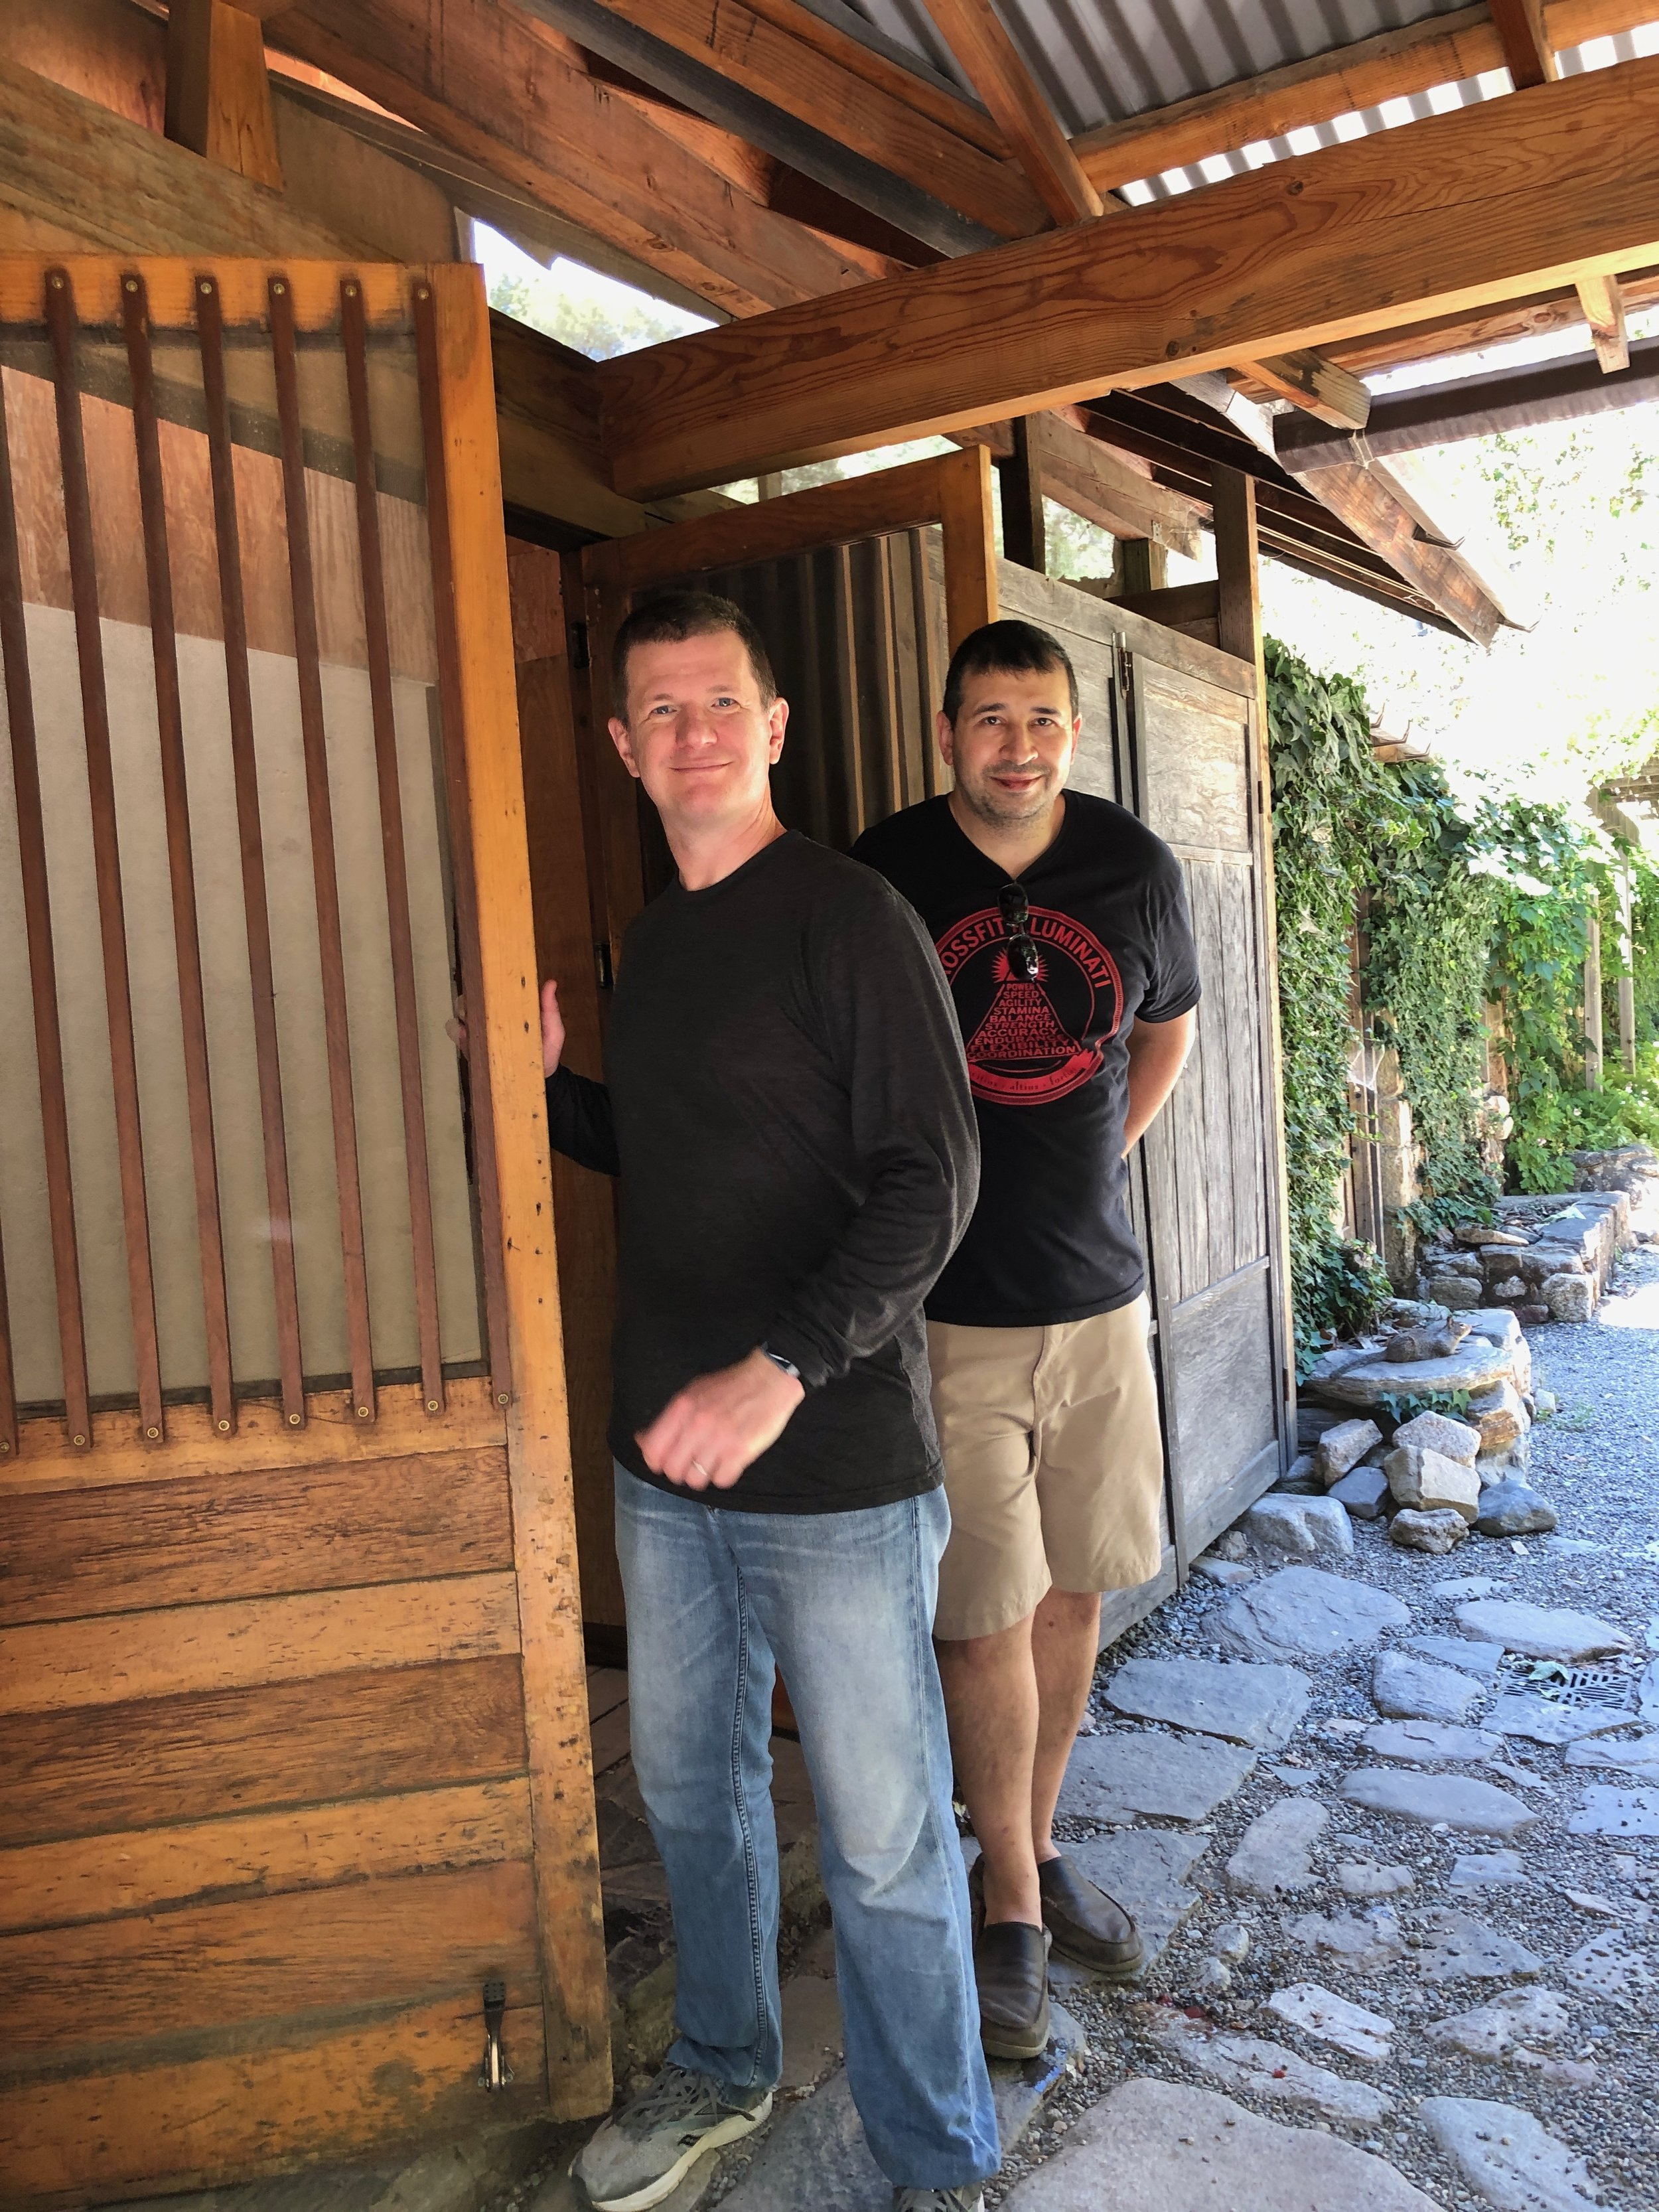 Kent Rutter and Zack Becker, Tassajara kitchen.